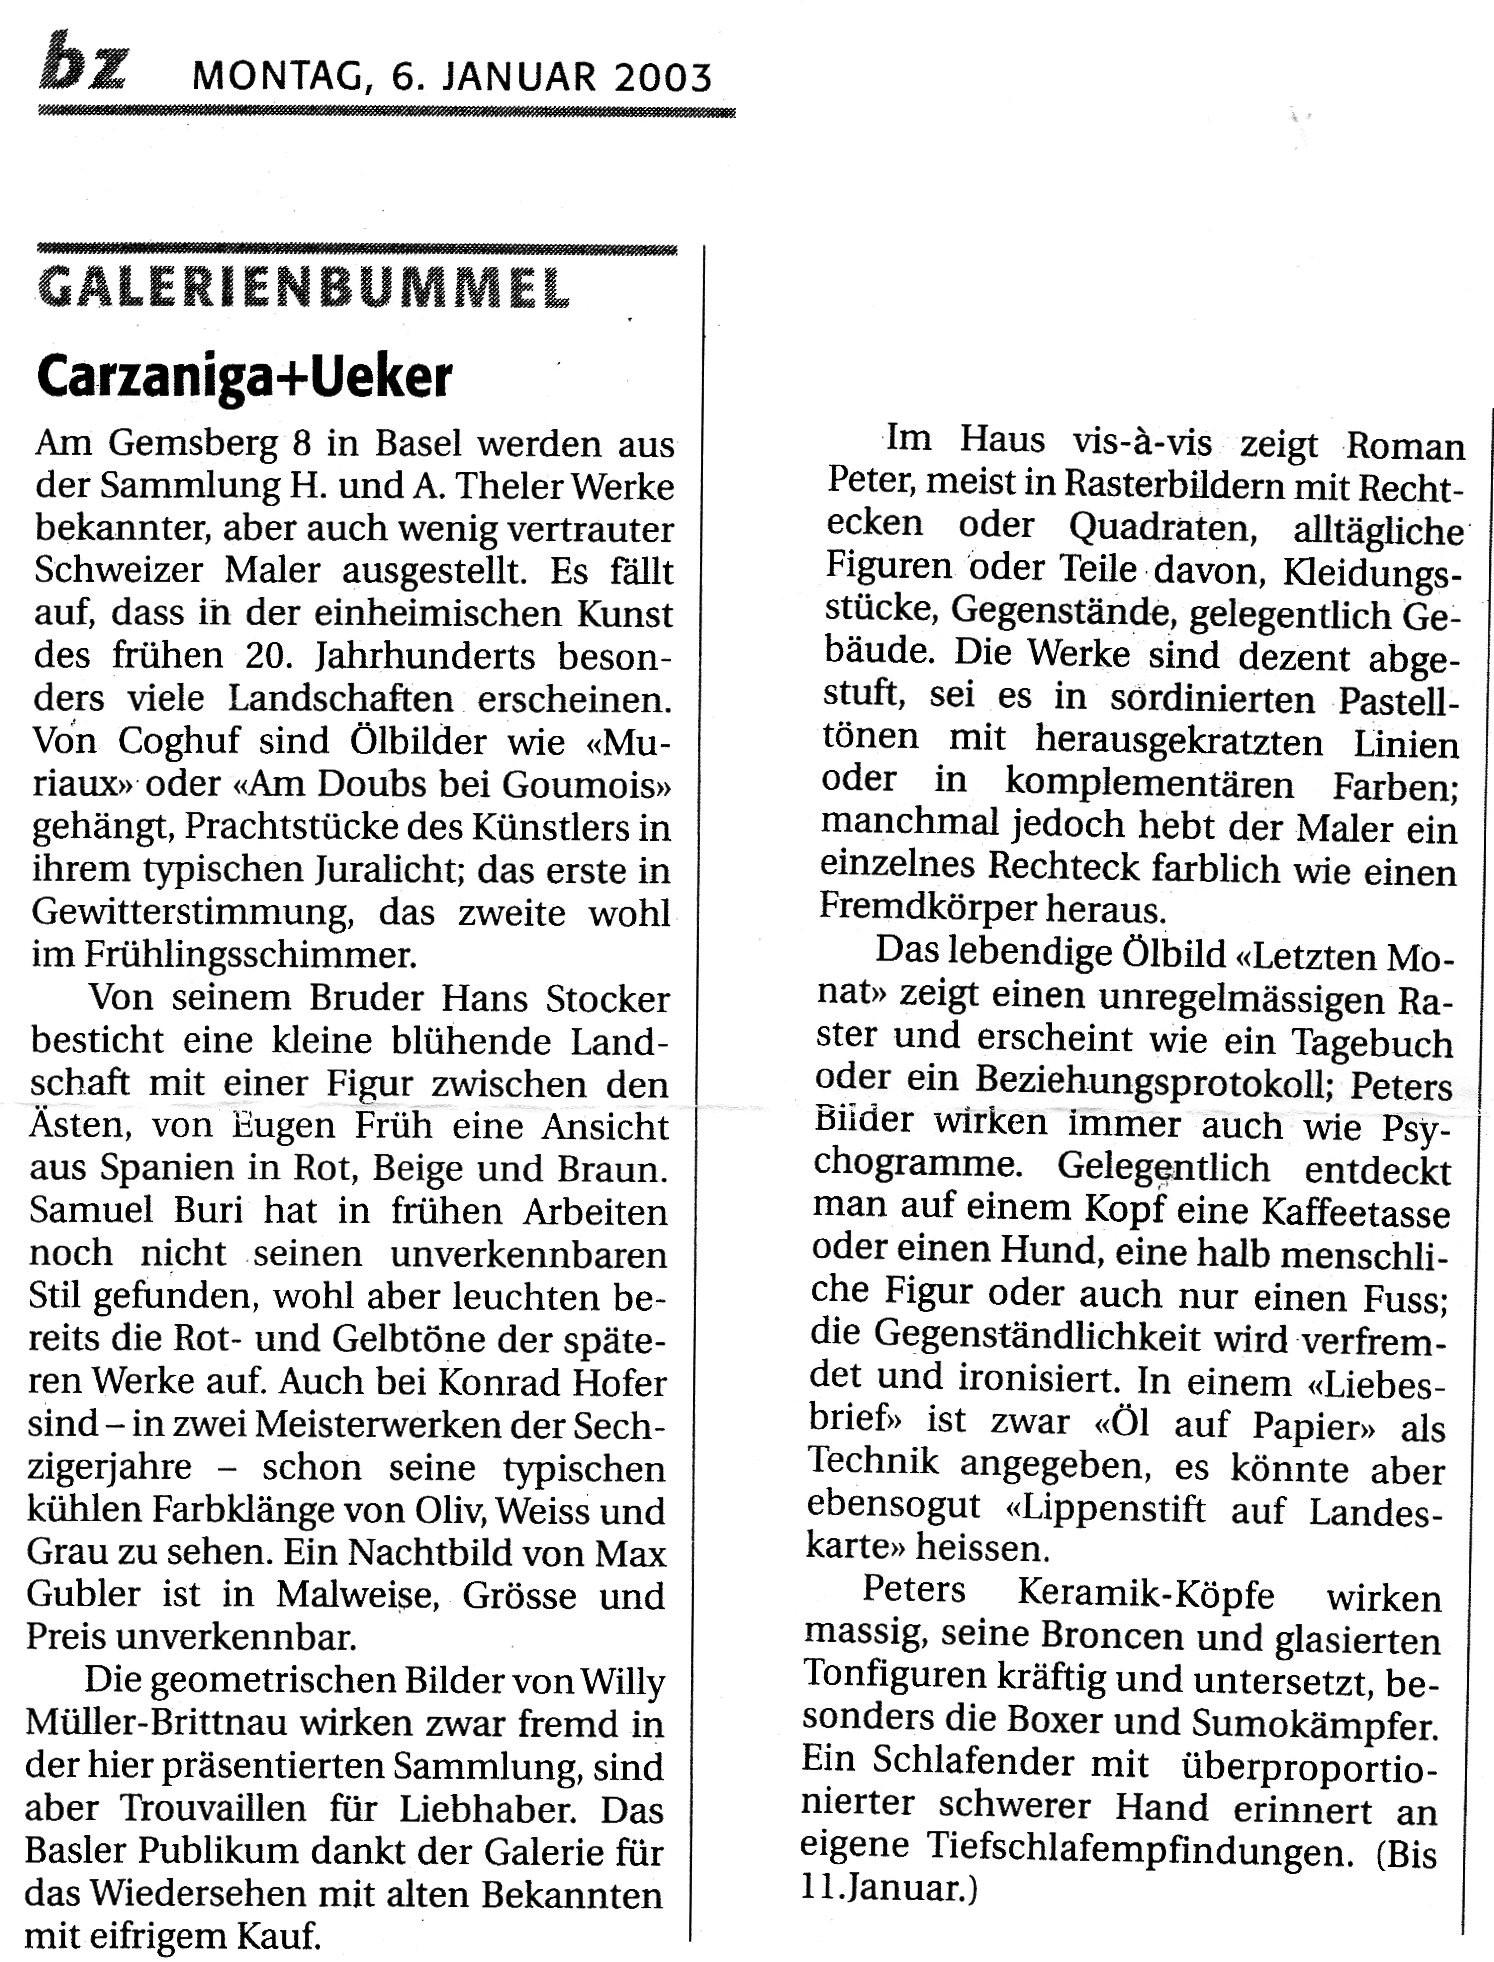 Januar 2003, bz Galerienbummel